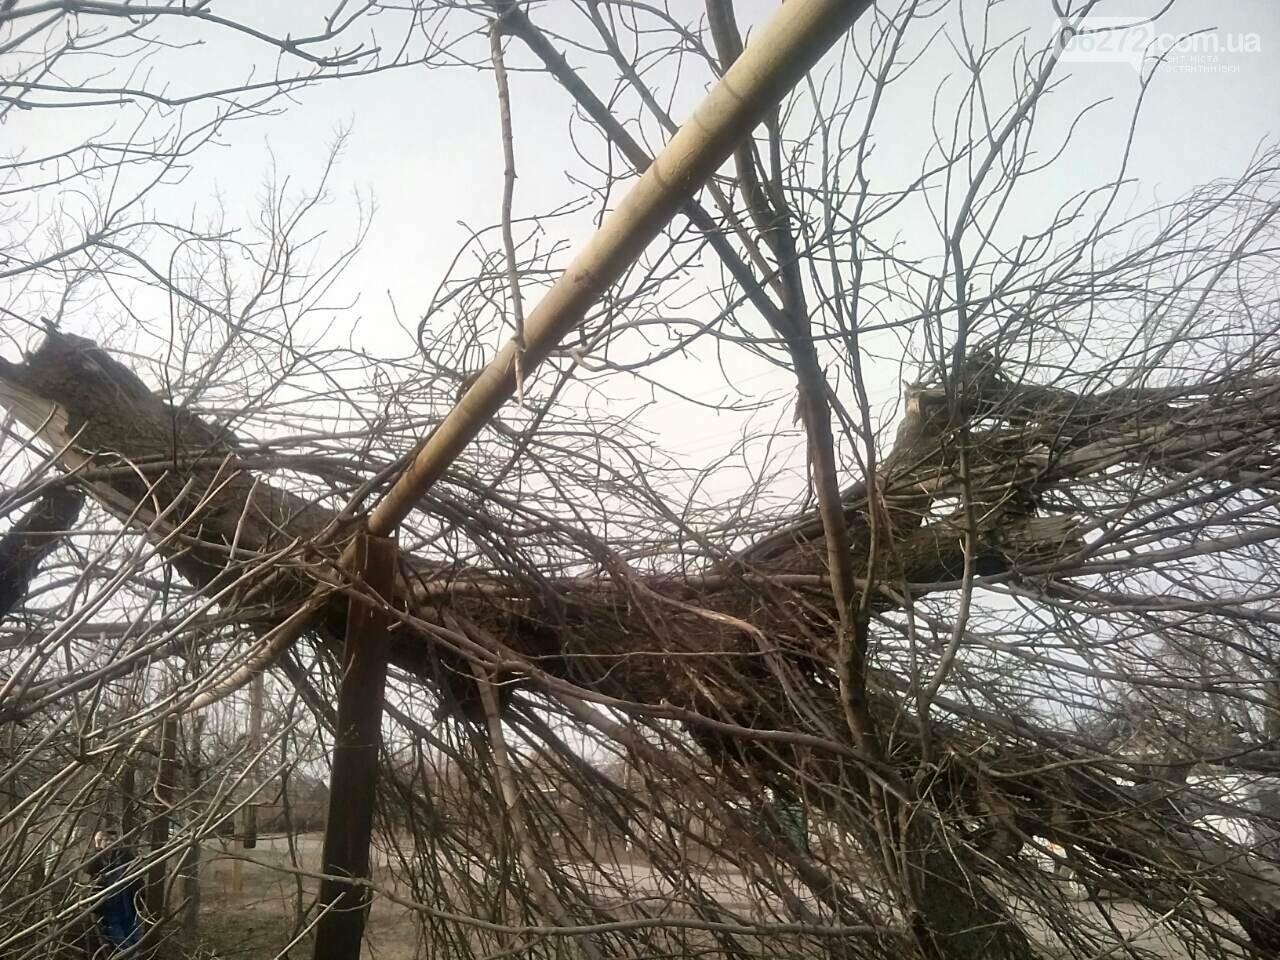 В Константиновском районе дерево упало на столб линии электропередач, фото-2